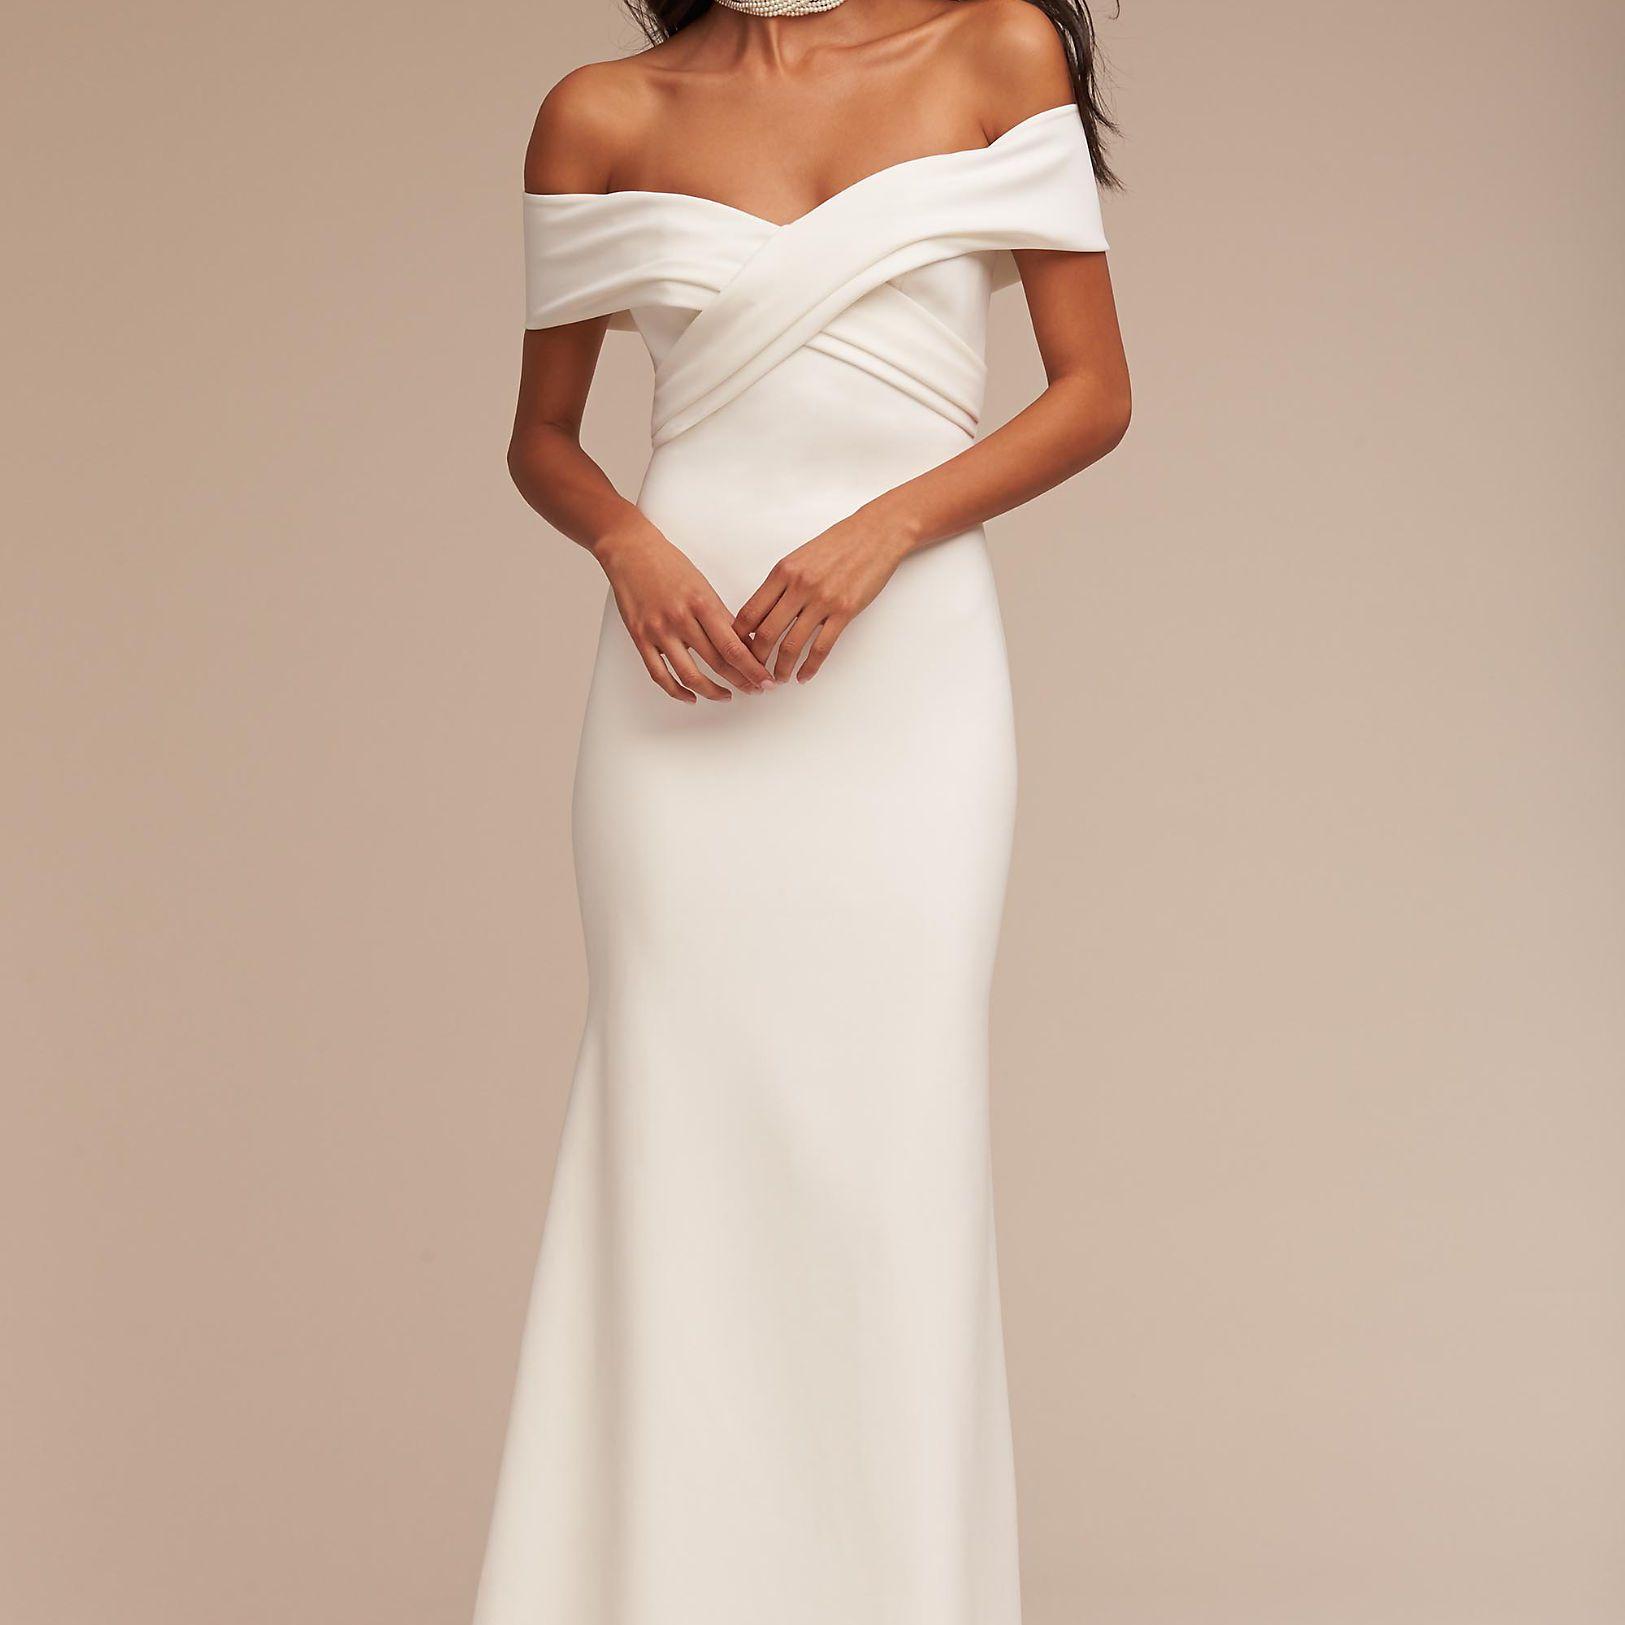 40 Wedding Dresses We Love Under $1,000